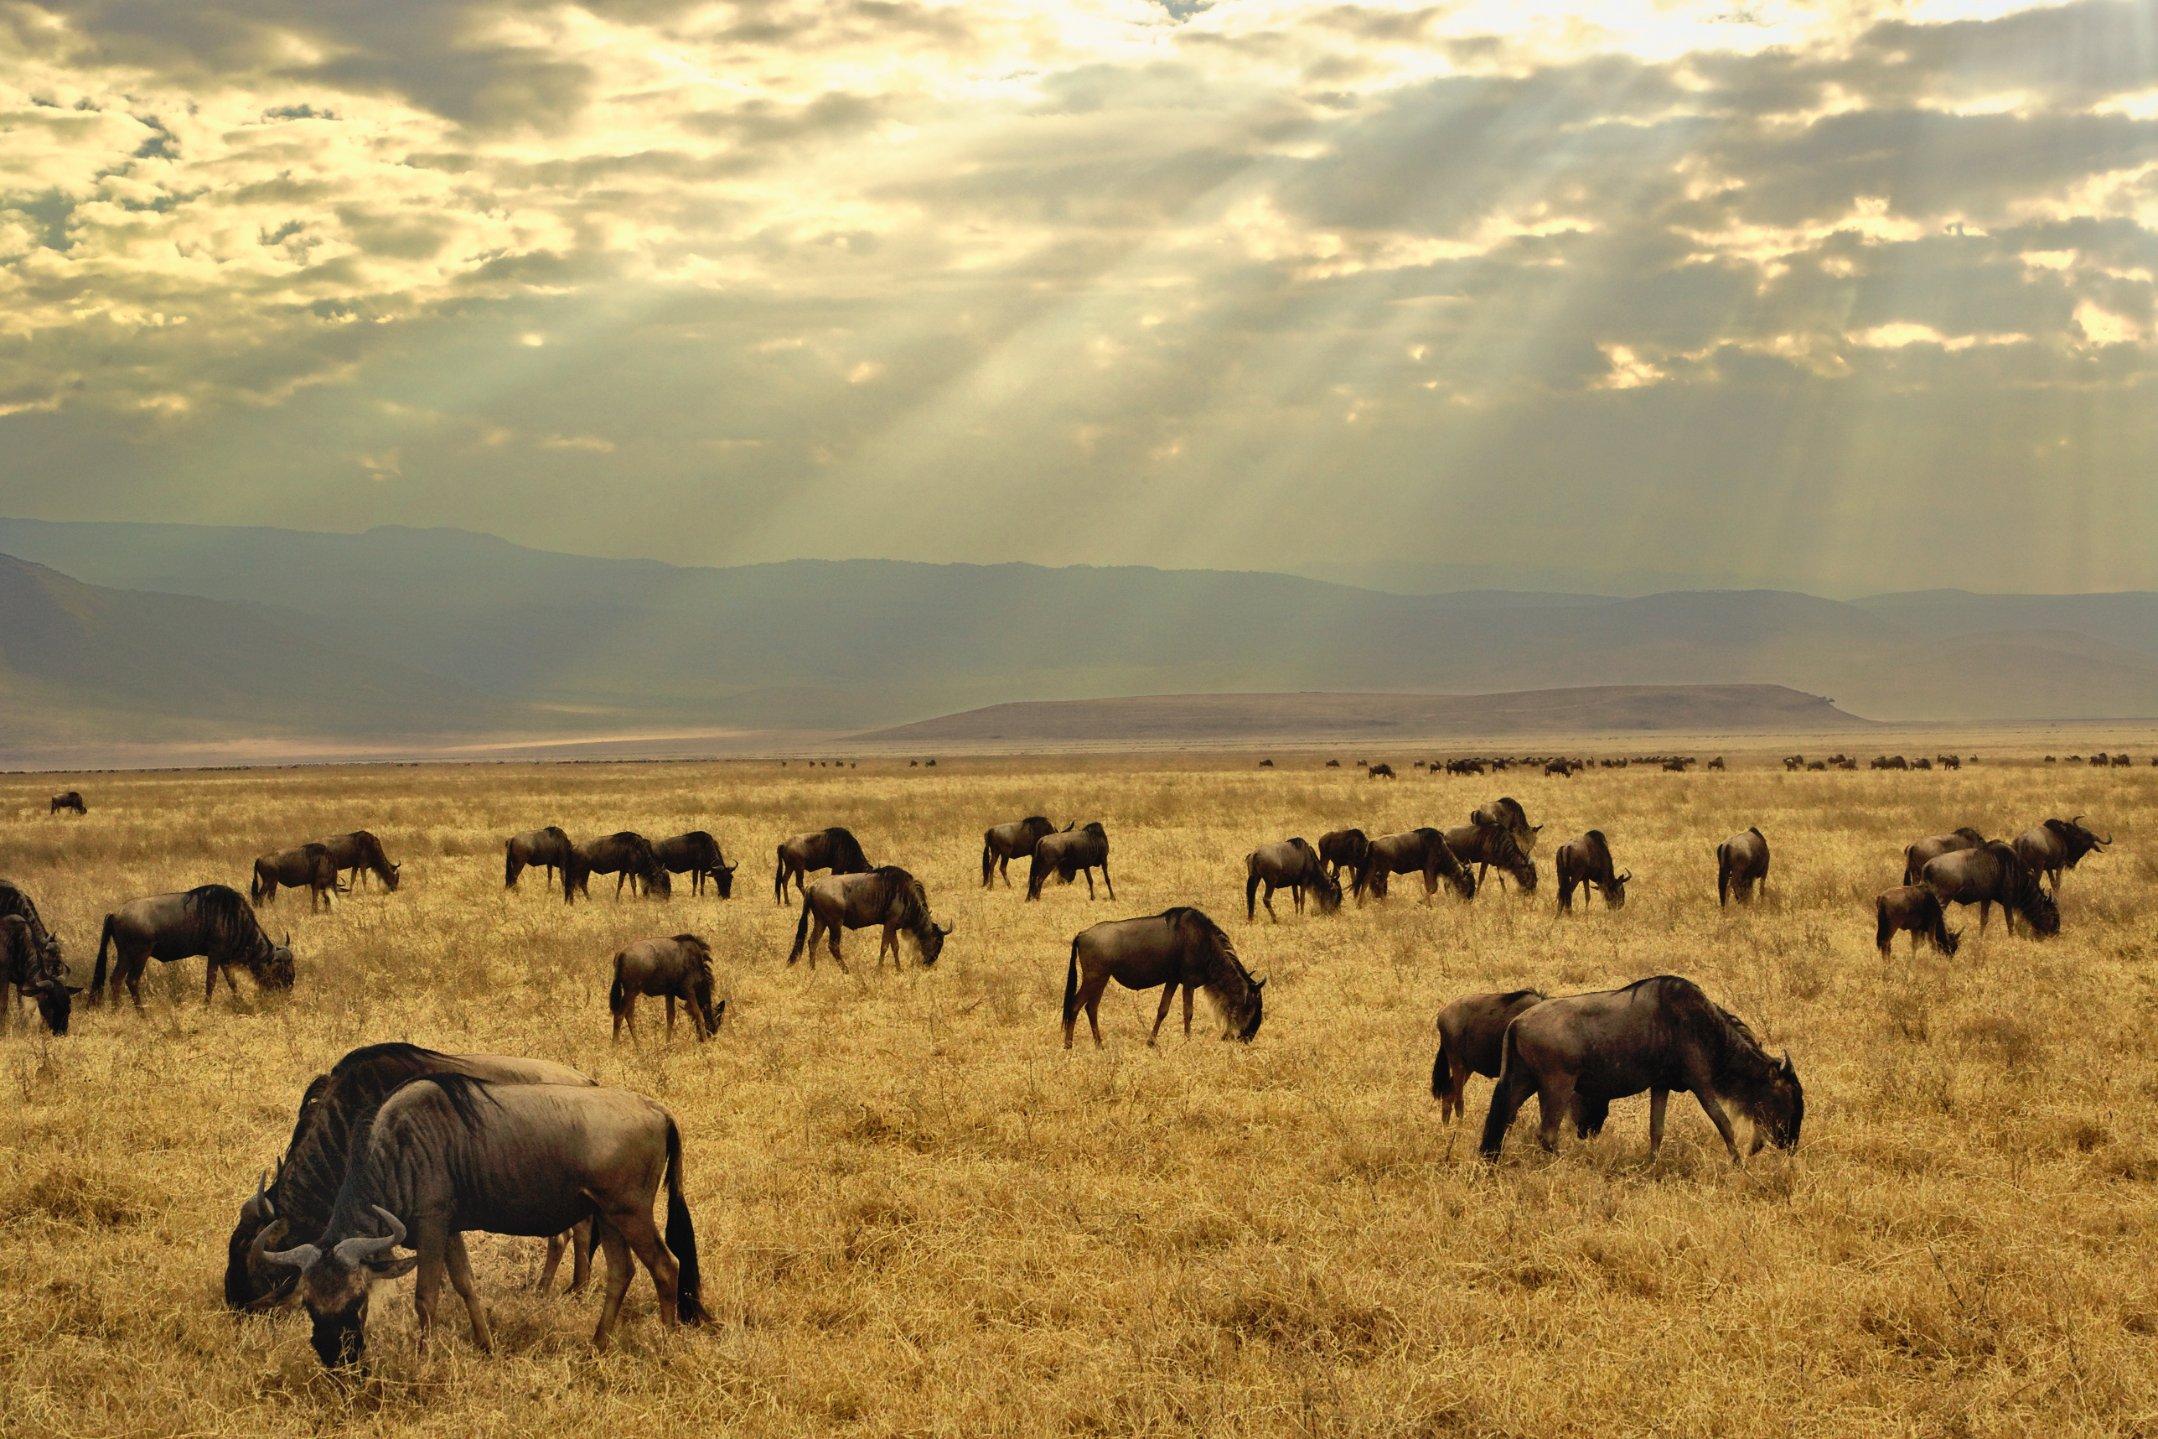 20 reasons to visit Tanzania now | CNN Travel